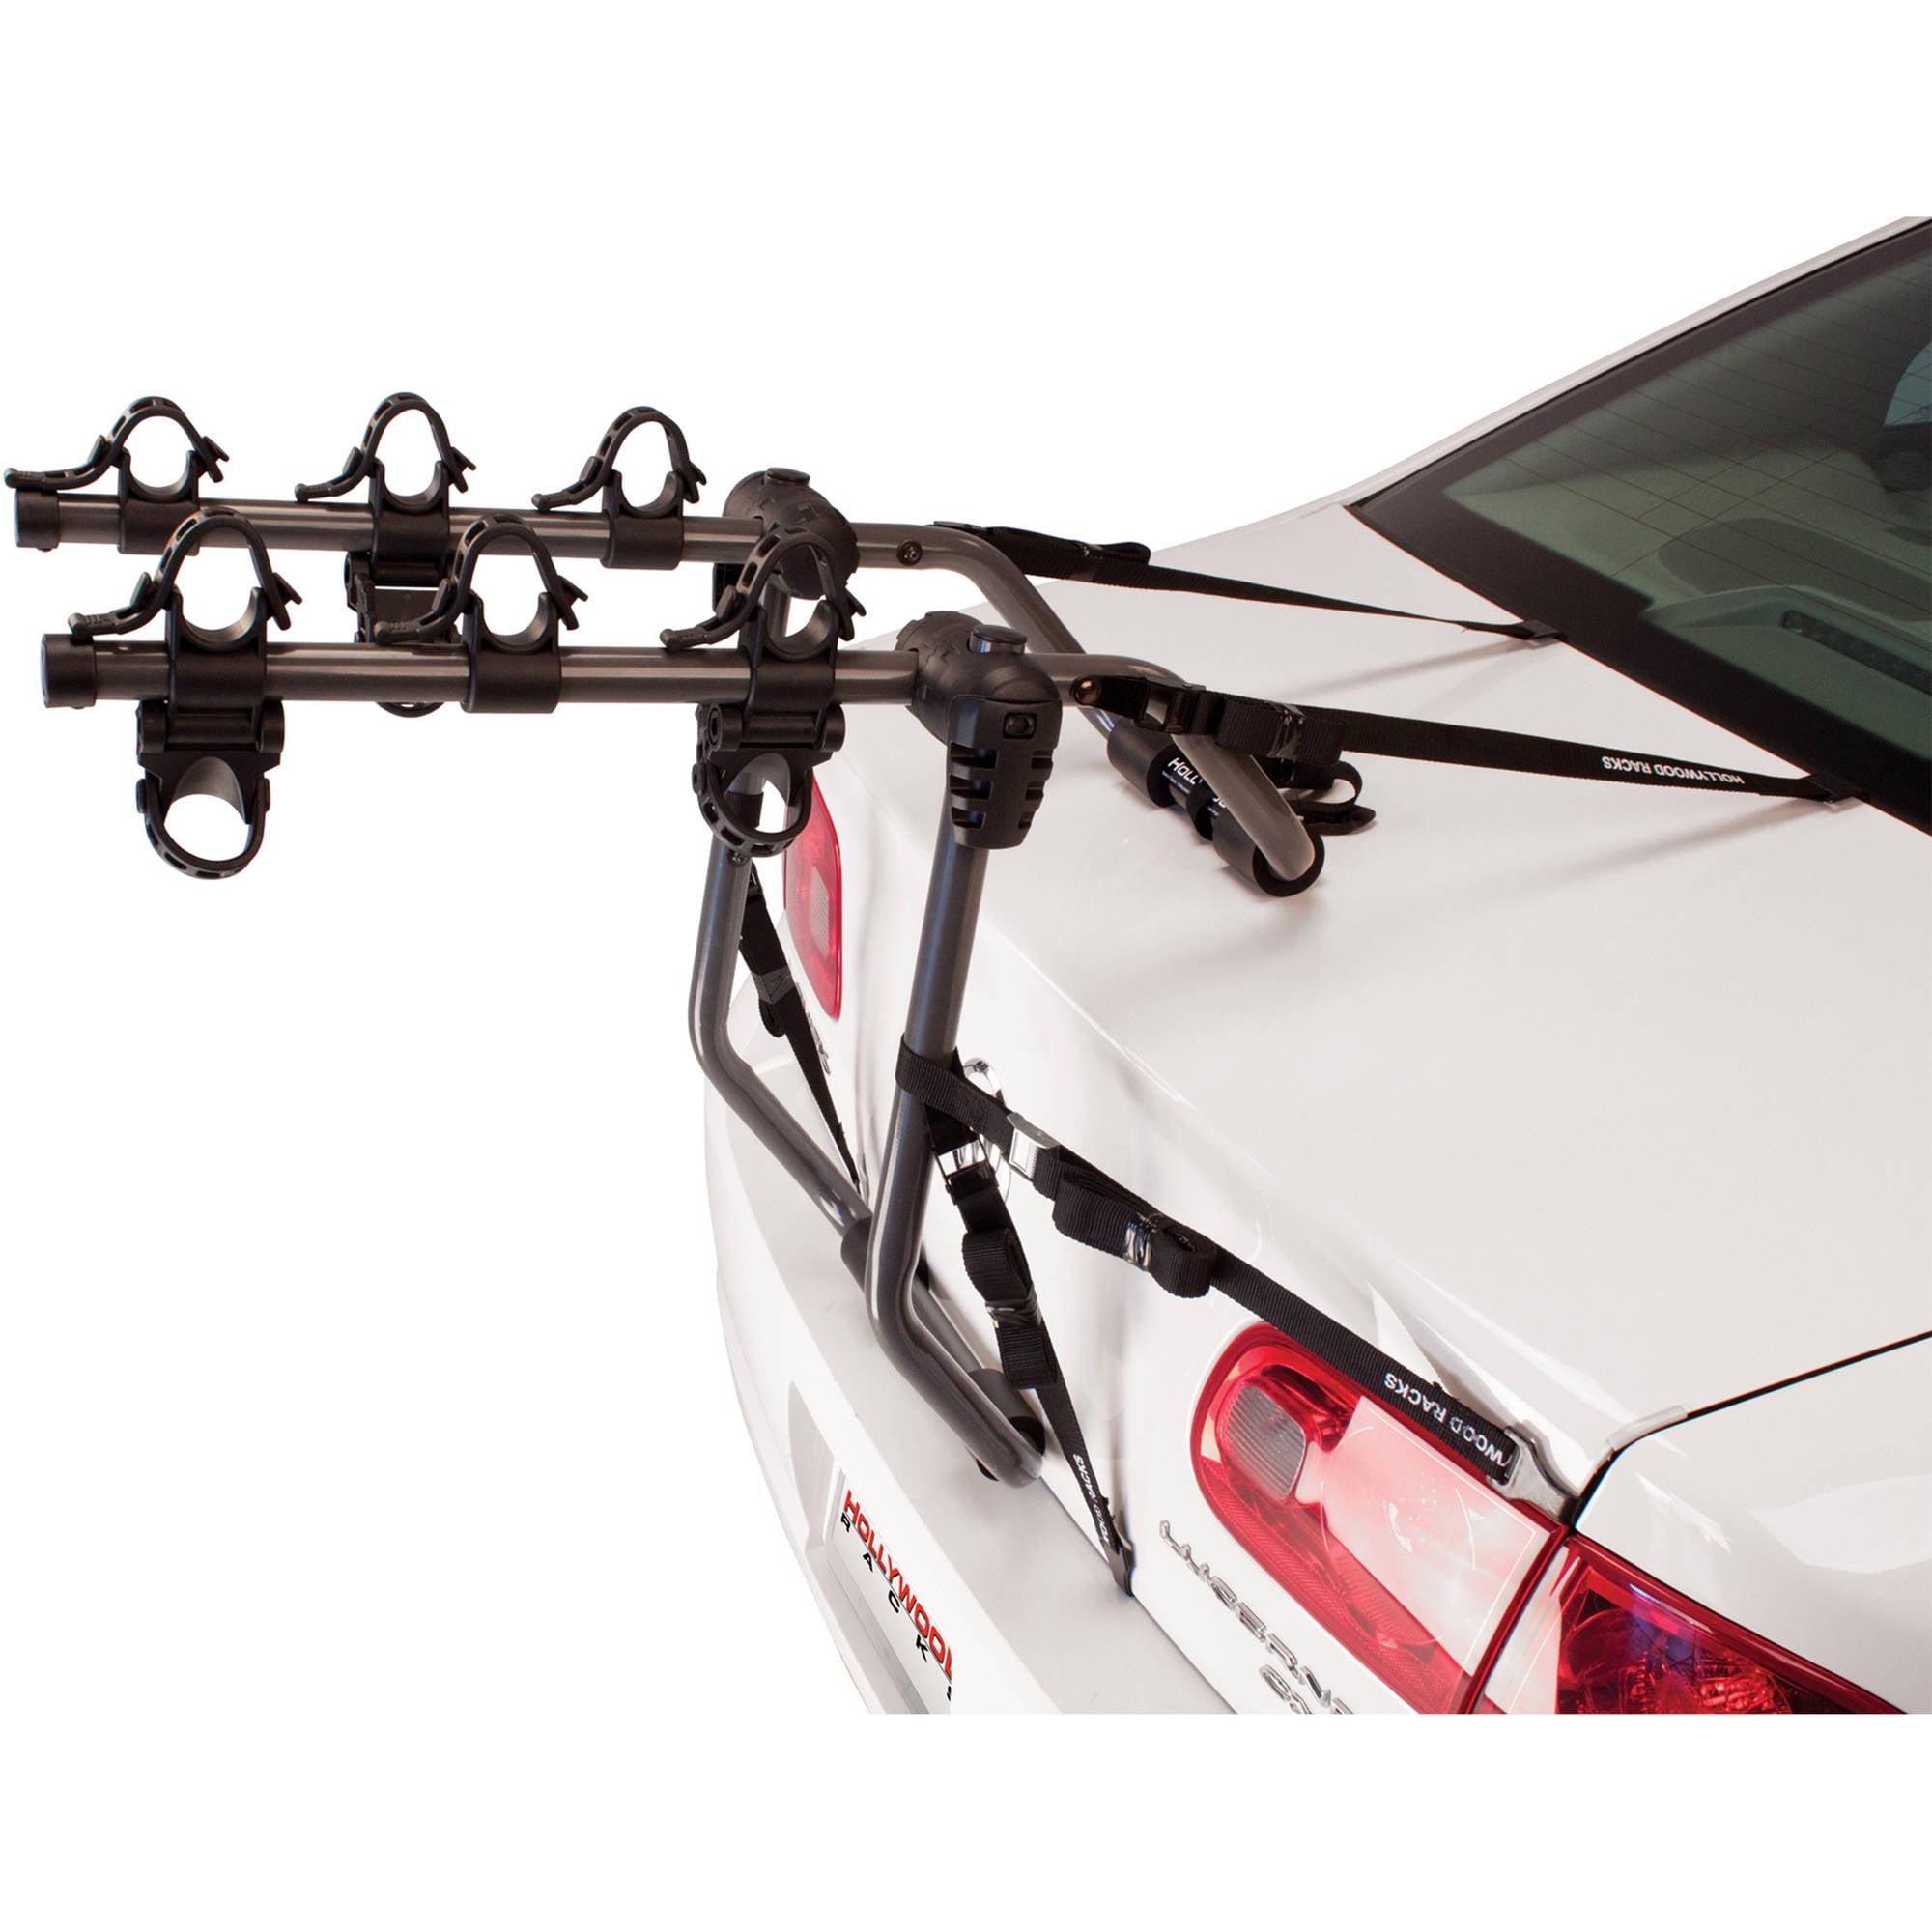 Hollywood Racks Express 3-Bike Rack